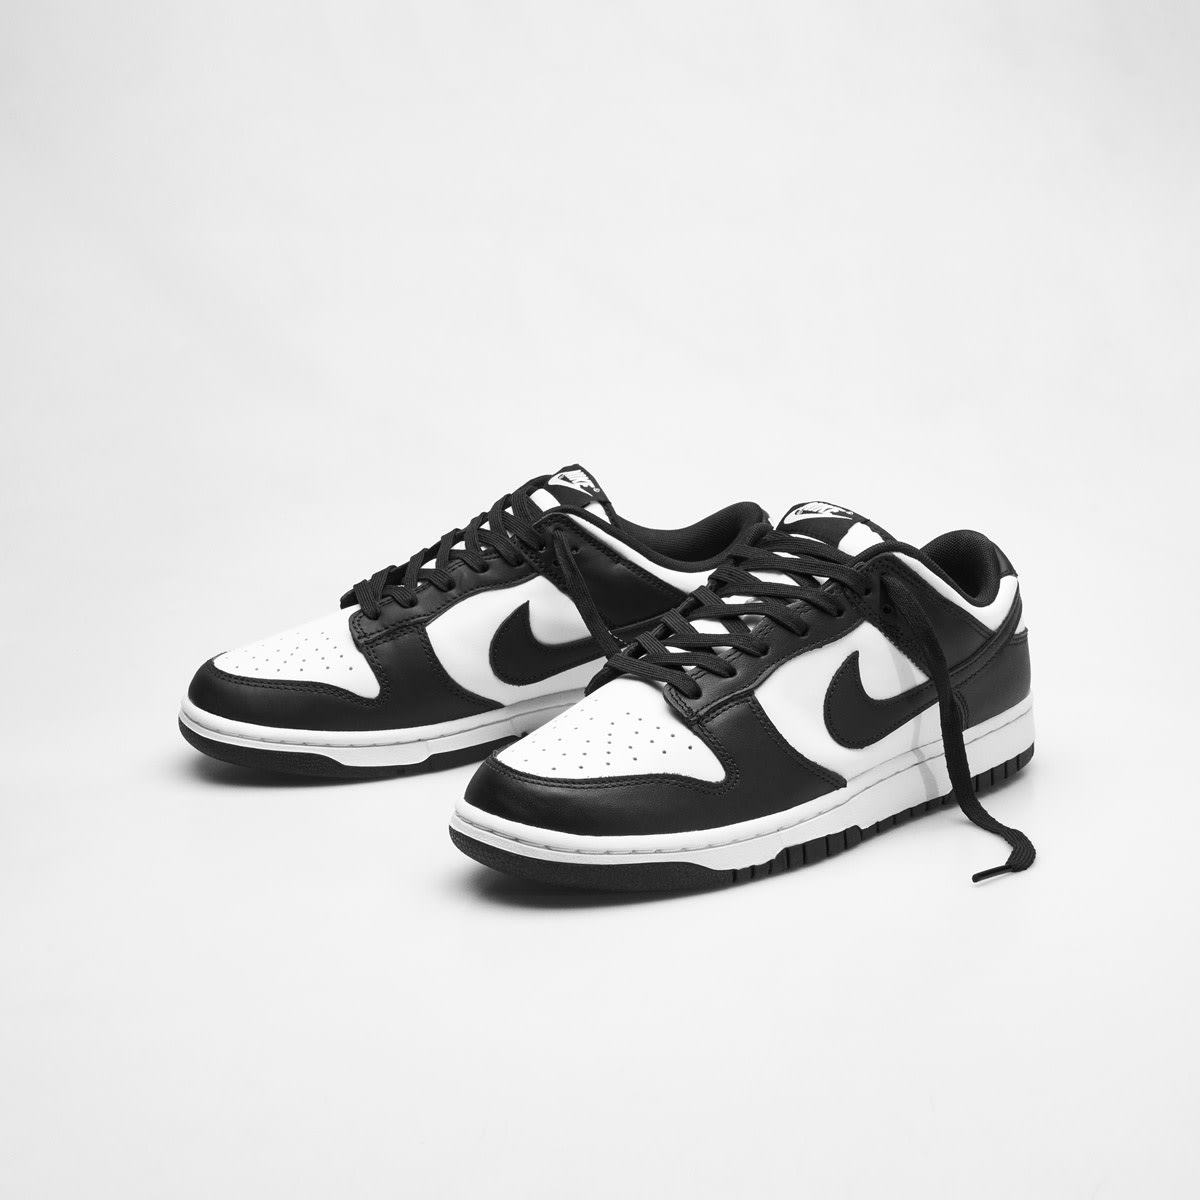 Espectador Compuesto mezcla  END. Launches - The destination for high heat sneaker releases